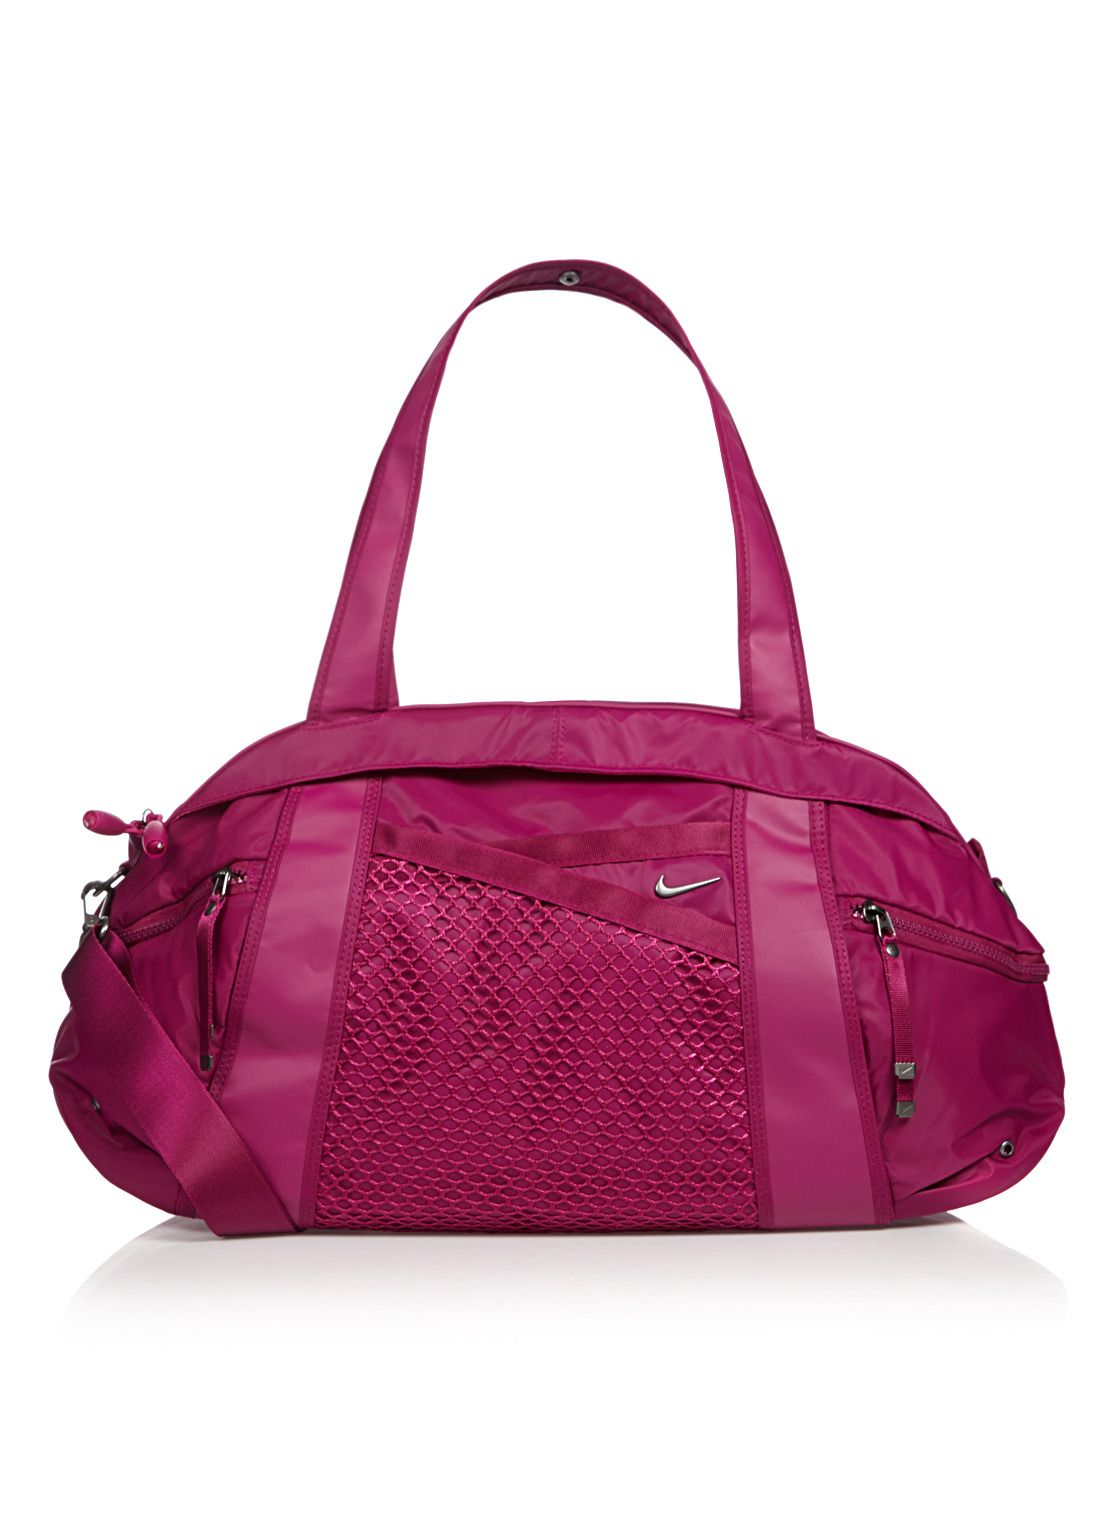 162df9419ae68 Nike Sporttas Victory Gym Club • de Bijenkorf | Travel Bags en 2019 ...